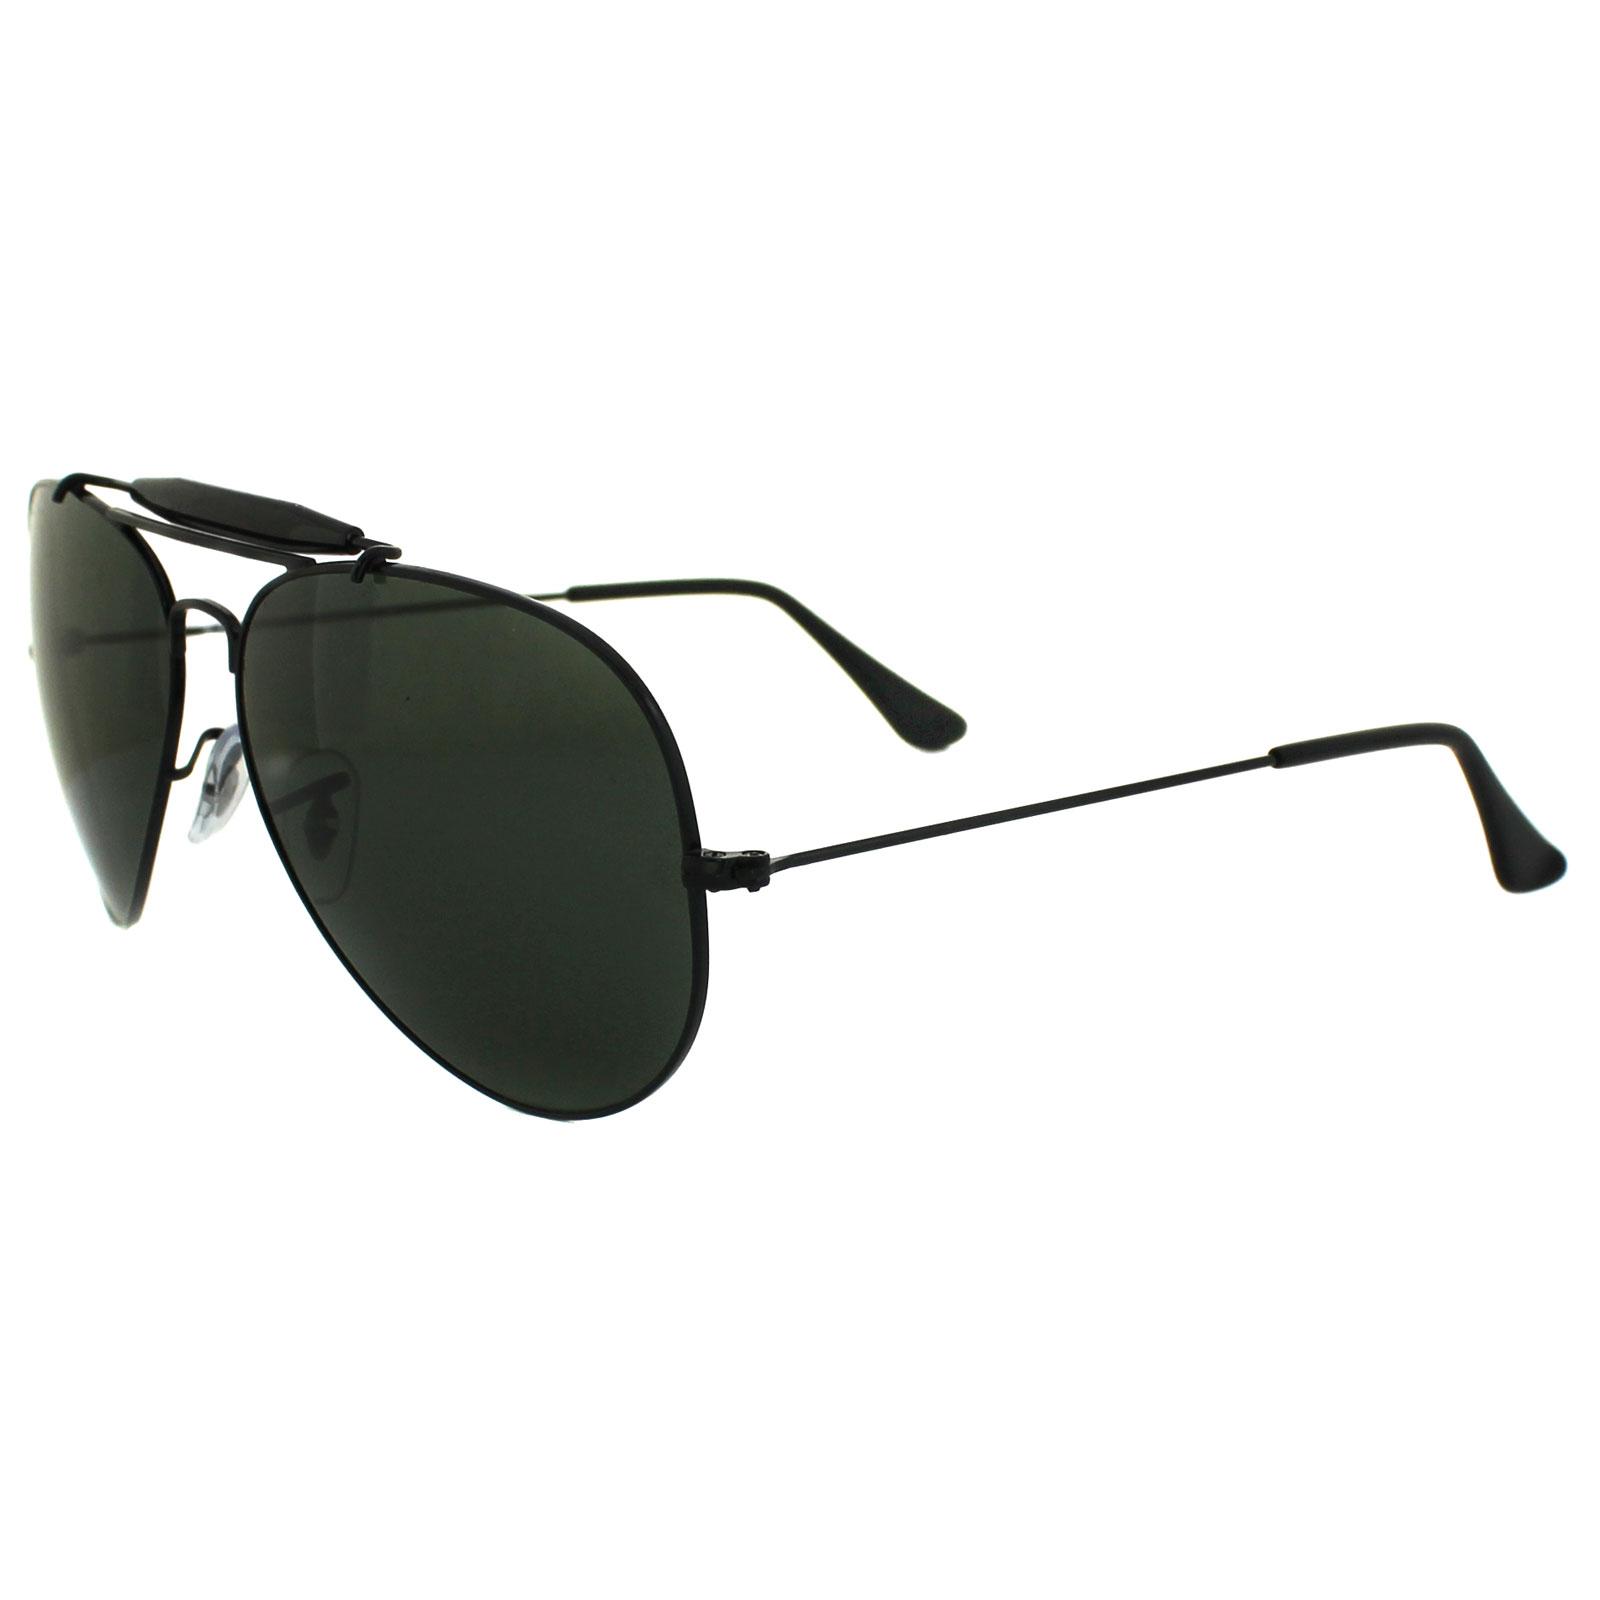 cacb2f2b6b Cheap Ray-Ban Outdoorsman II 3029 Sunglasses - Discounted Sunglasses